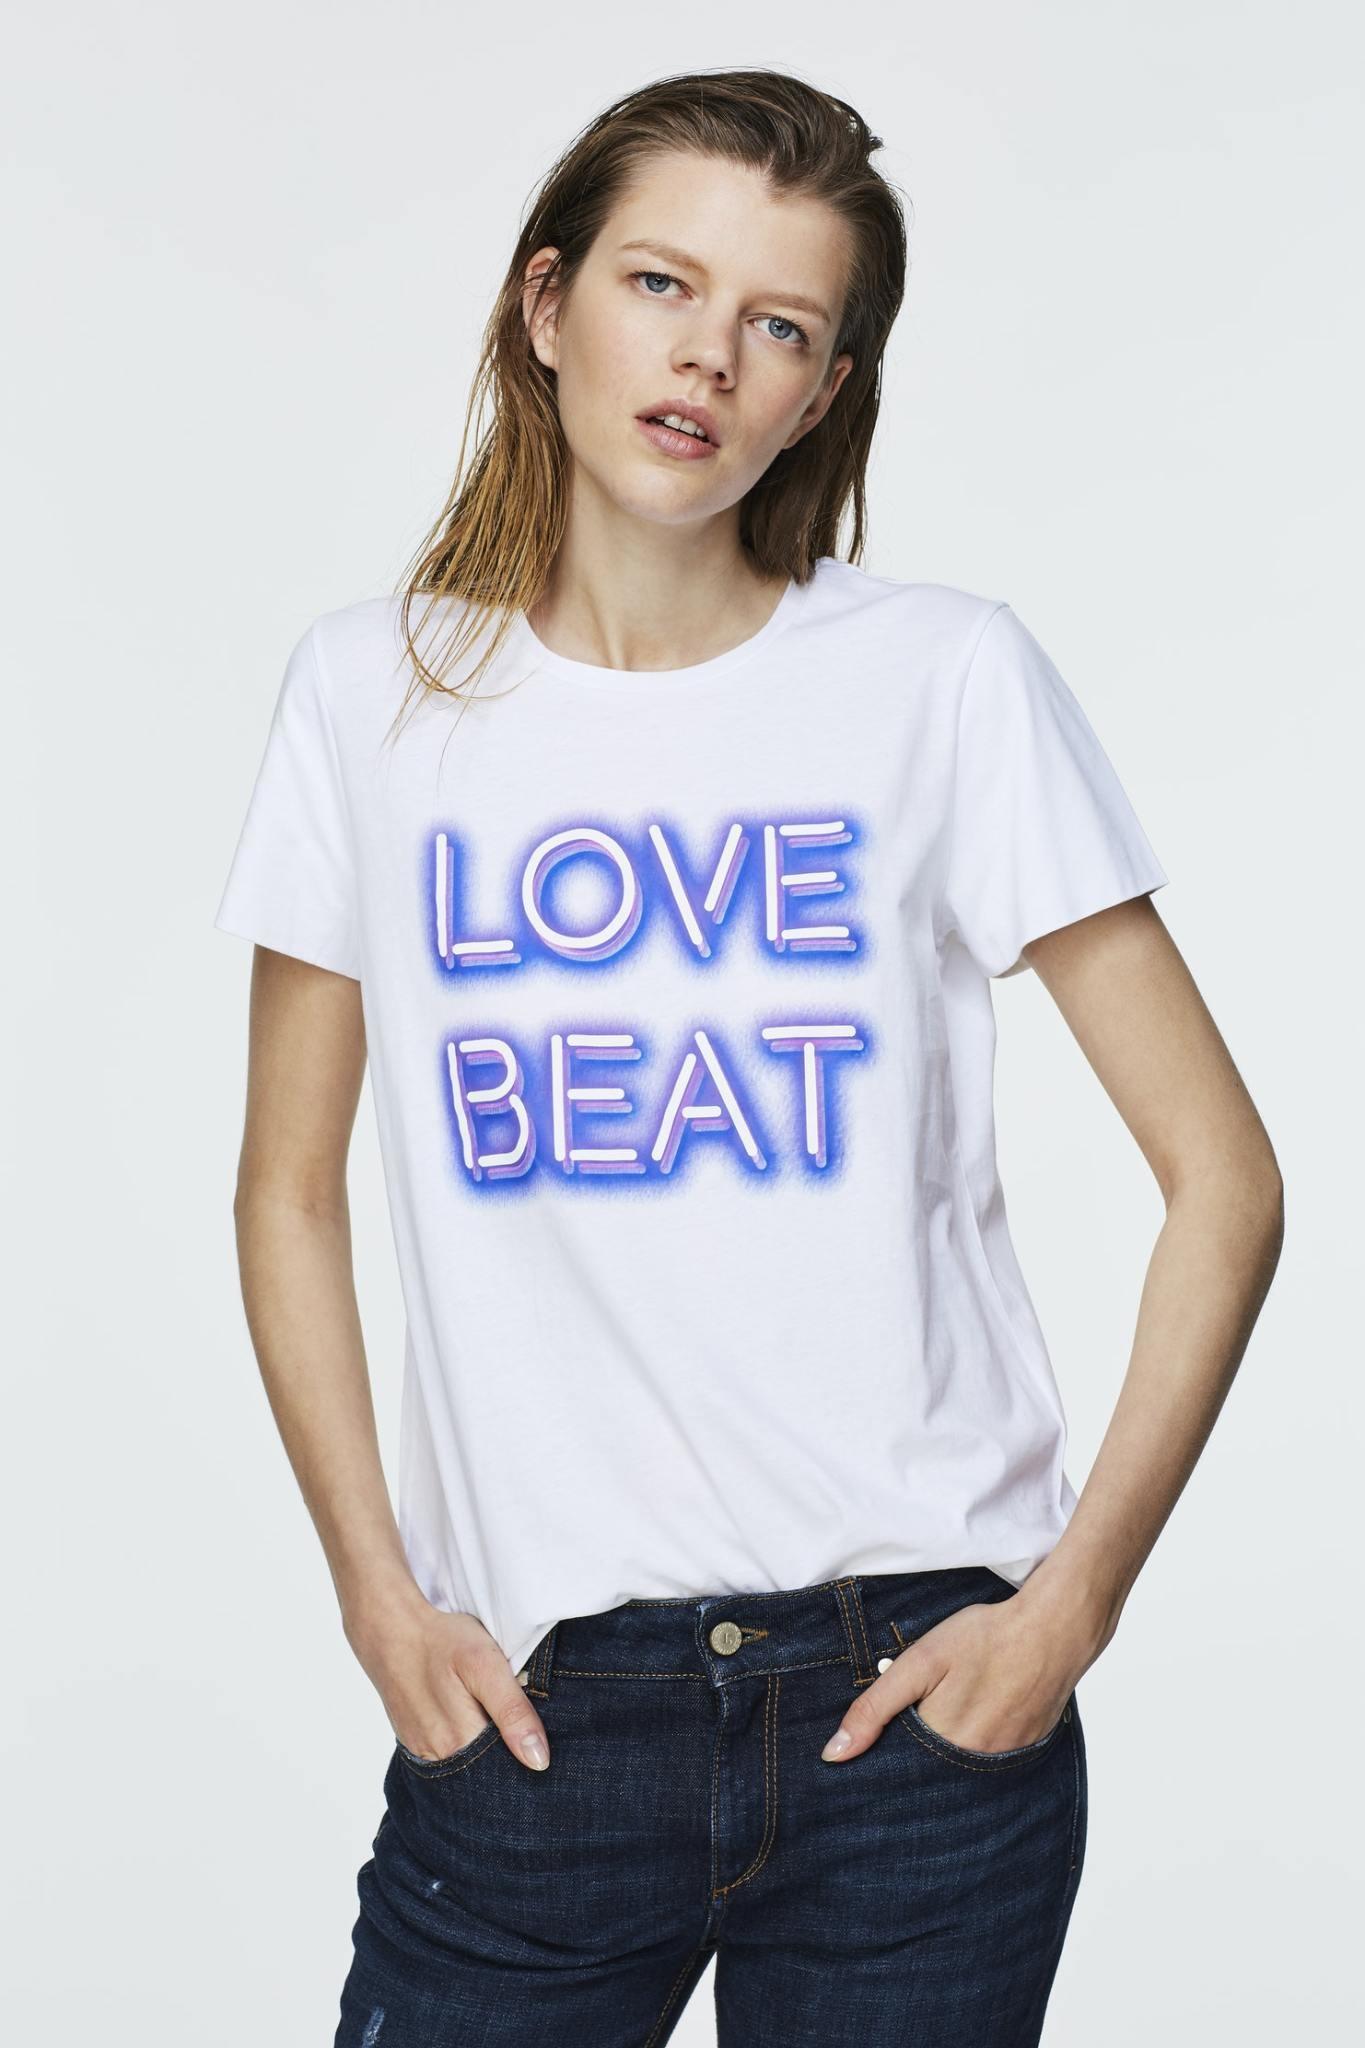 Neon love beat shirt dorothee schumacher-1